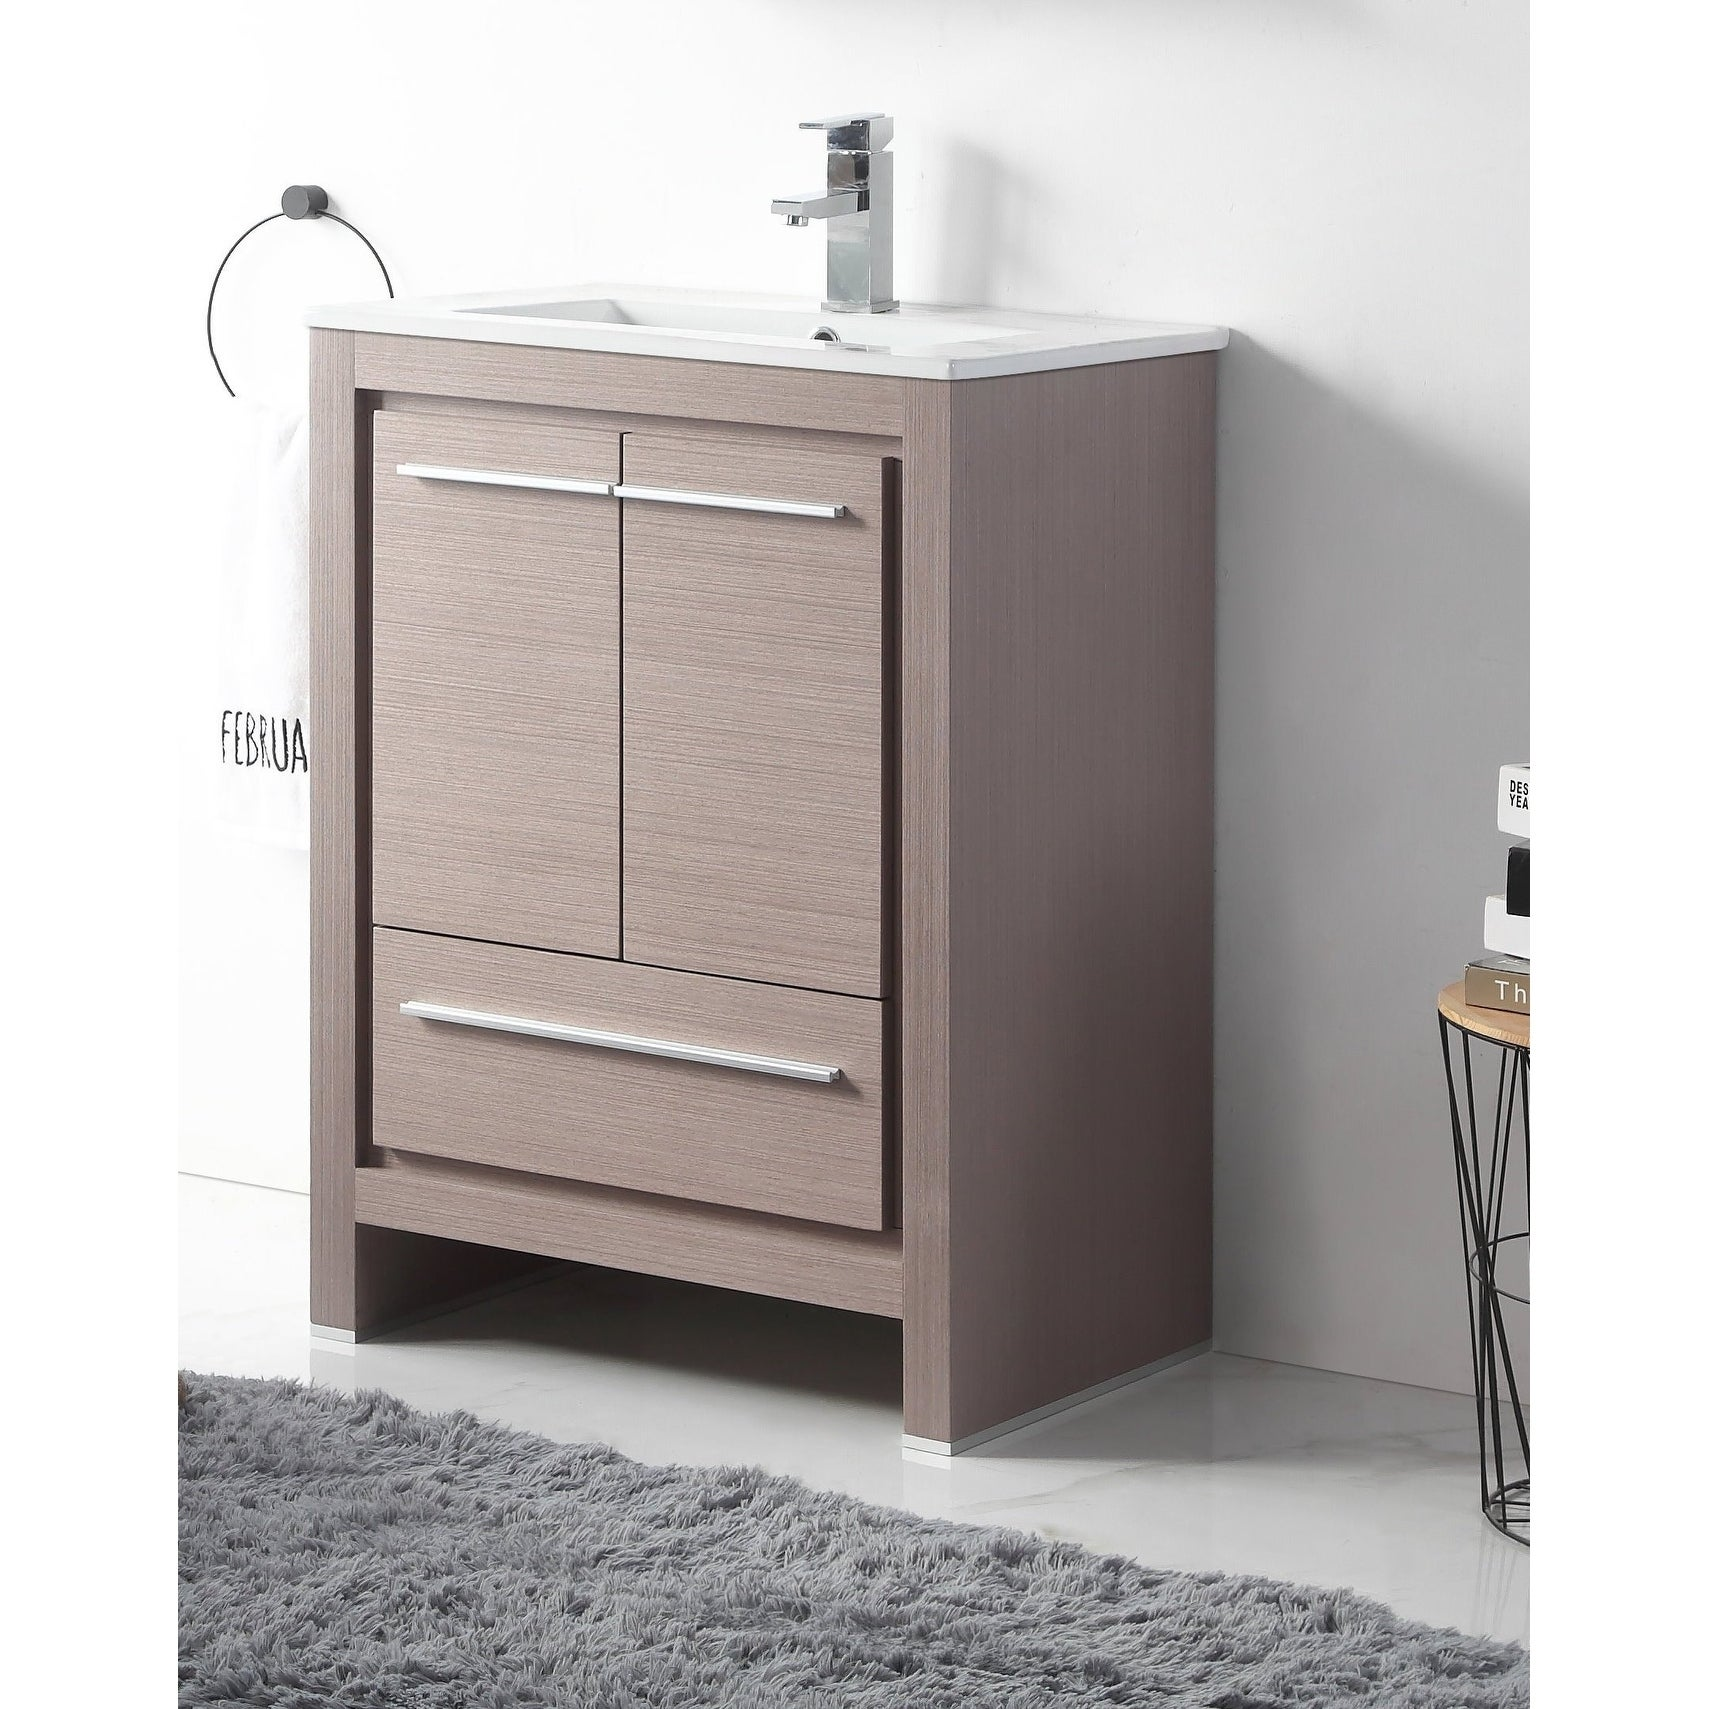 24 Viara Gray Oak Slim Small Modern Bathroom Vanity On Sale Overstock 26279536